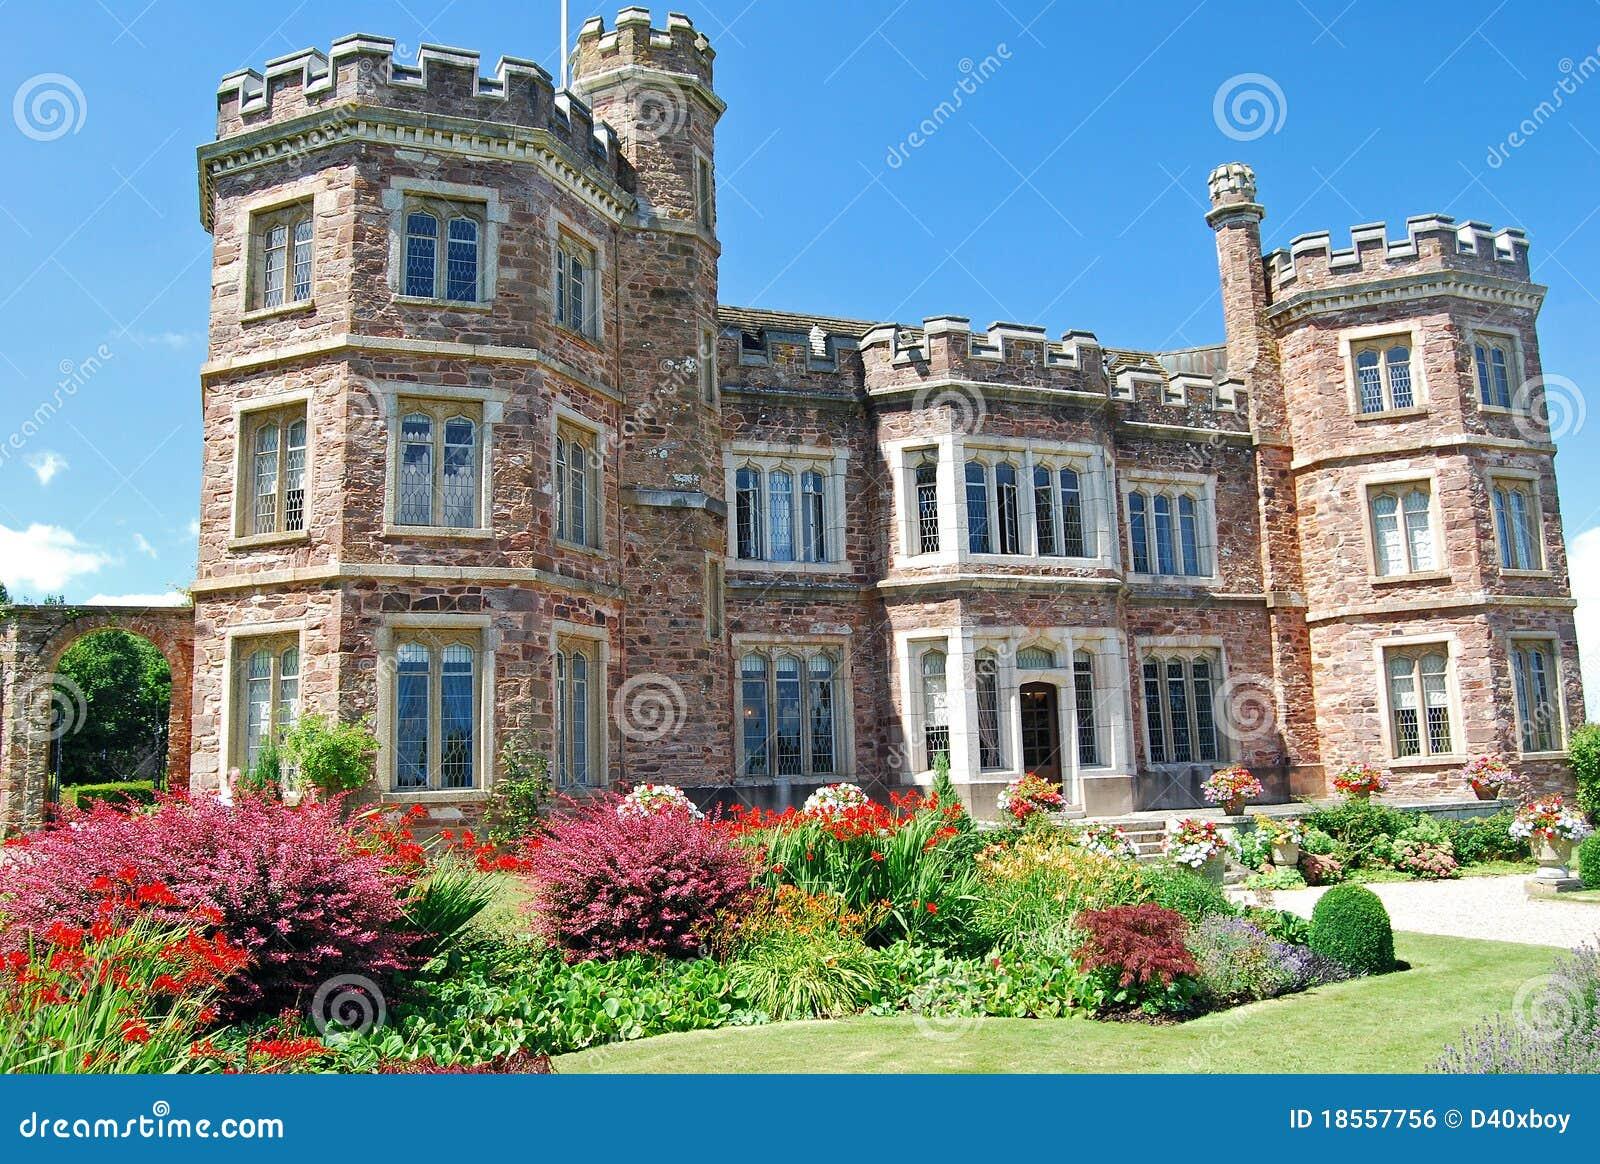 Red Brick Manor House Royalty Free Stock Image Image